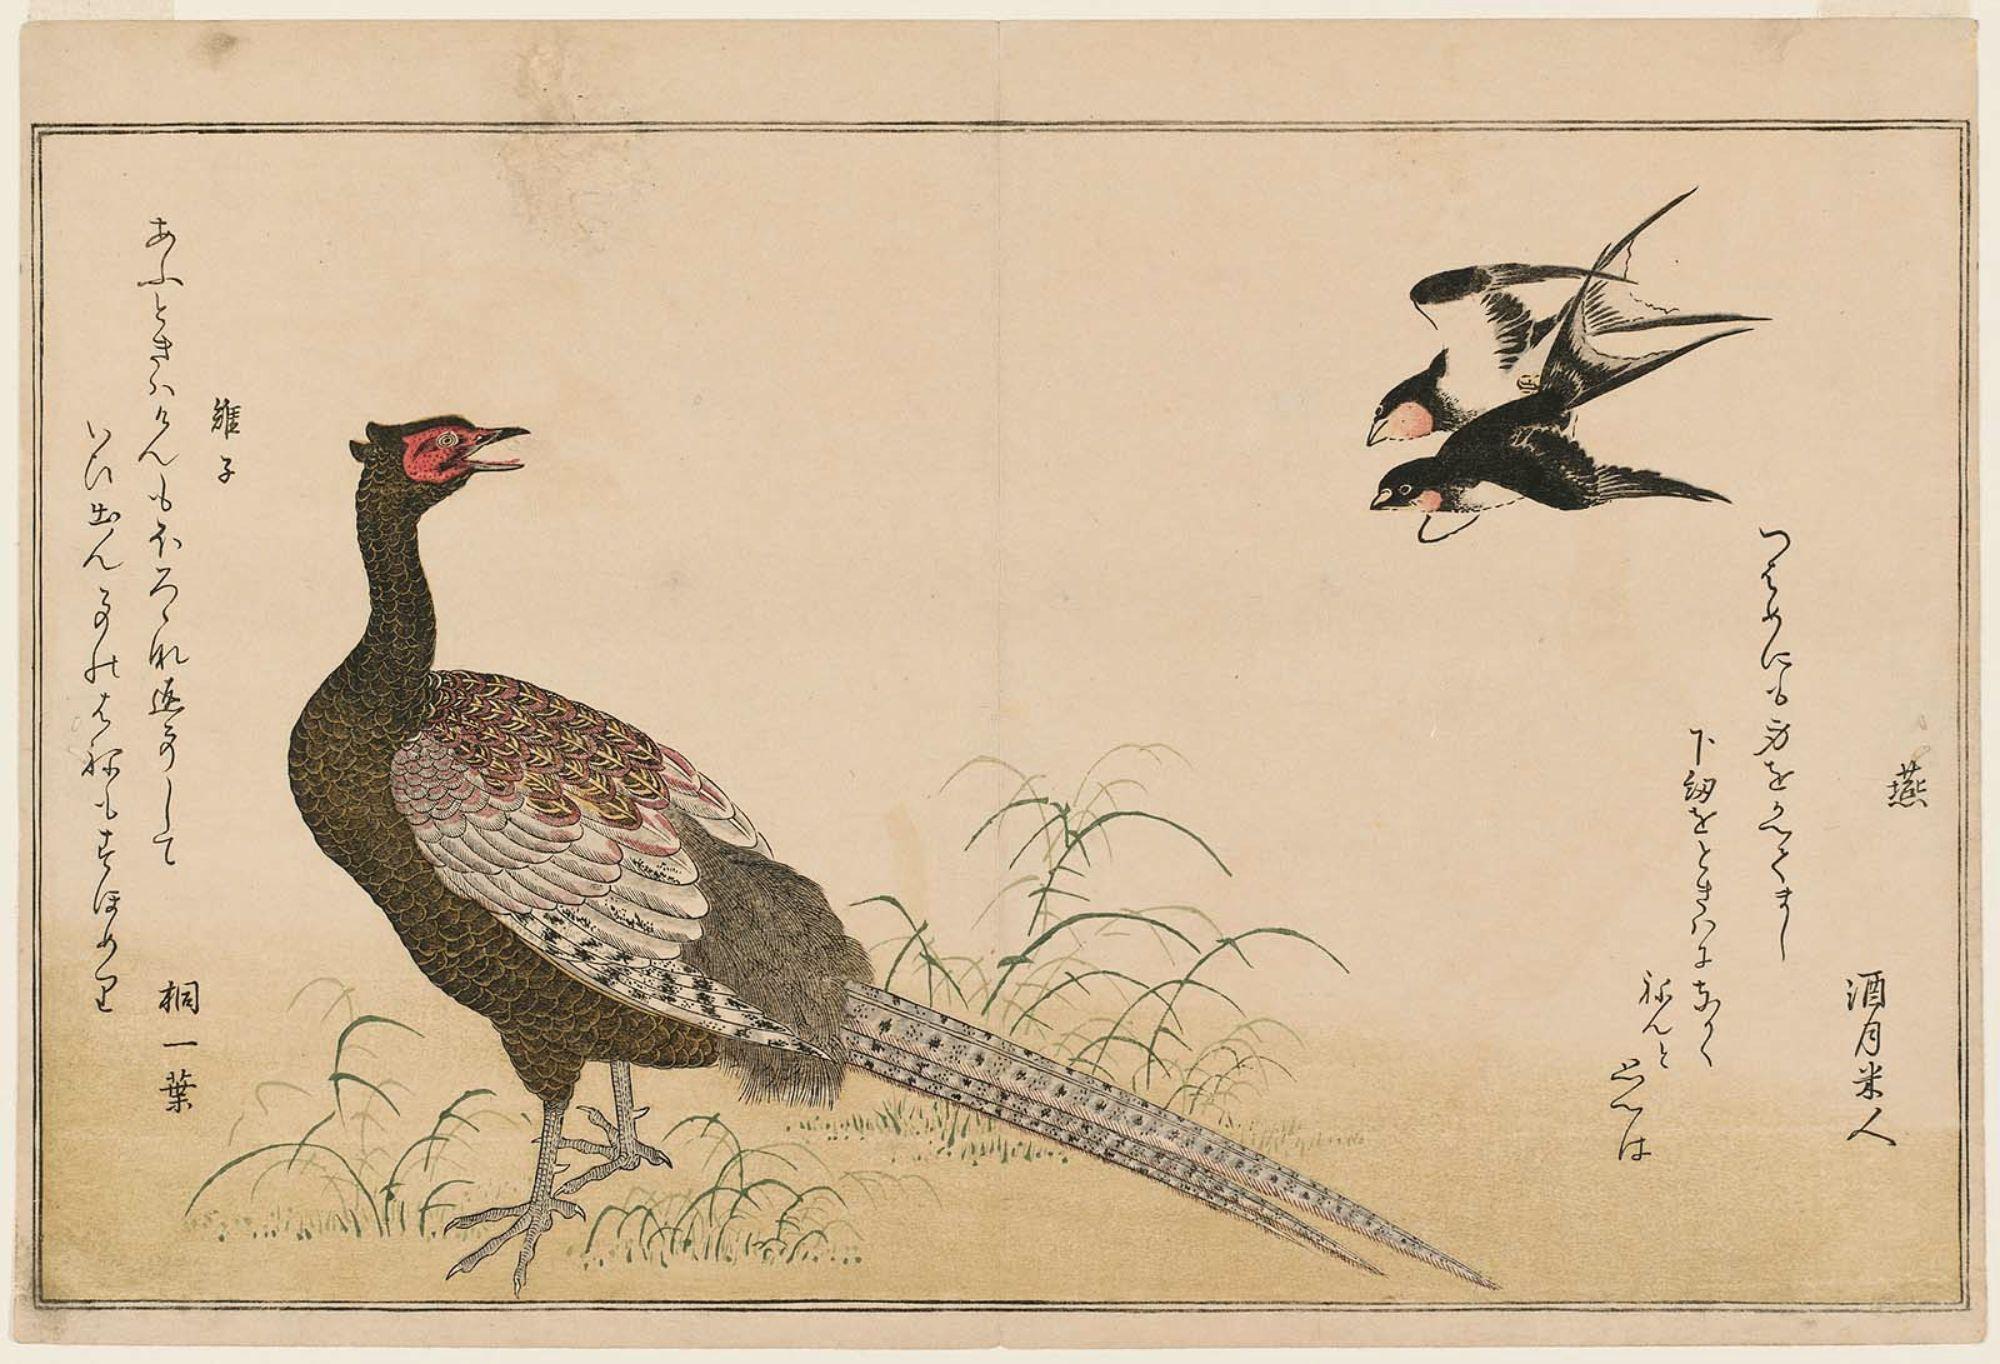 Kitagawa Utamaro Swallows Tsubame And Green Pheasant Kiji From The Album Momo Chidori Kyoka Awase Myr Bird Drawings Japanese Artwork Museum Of Fine Arts